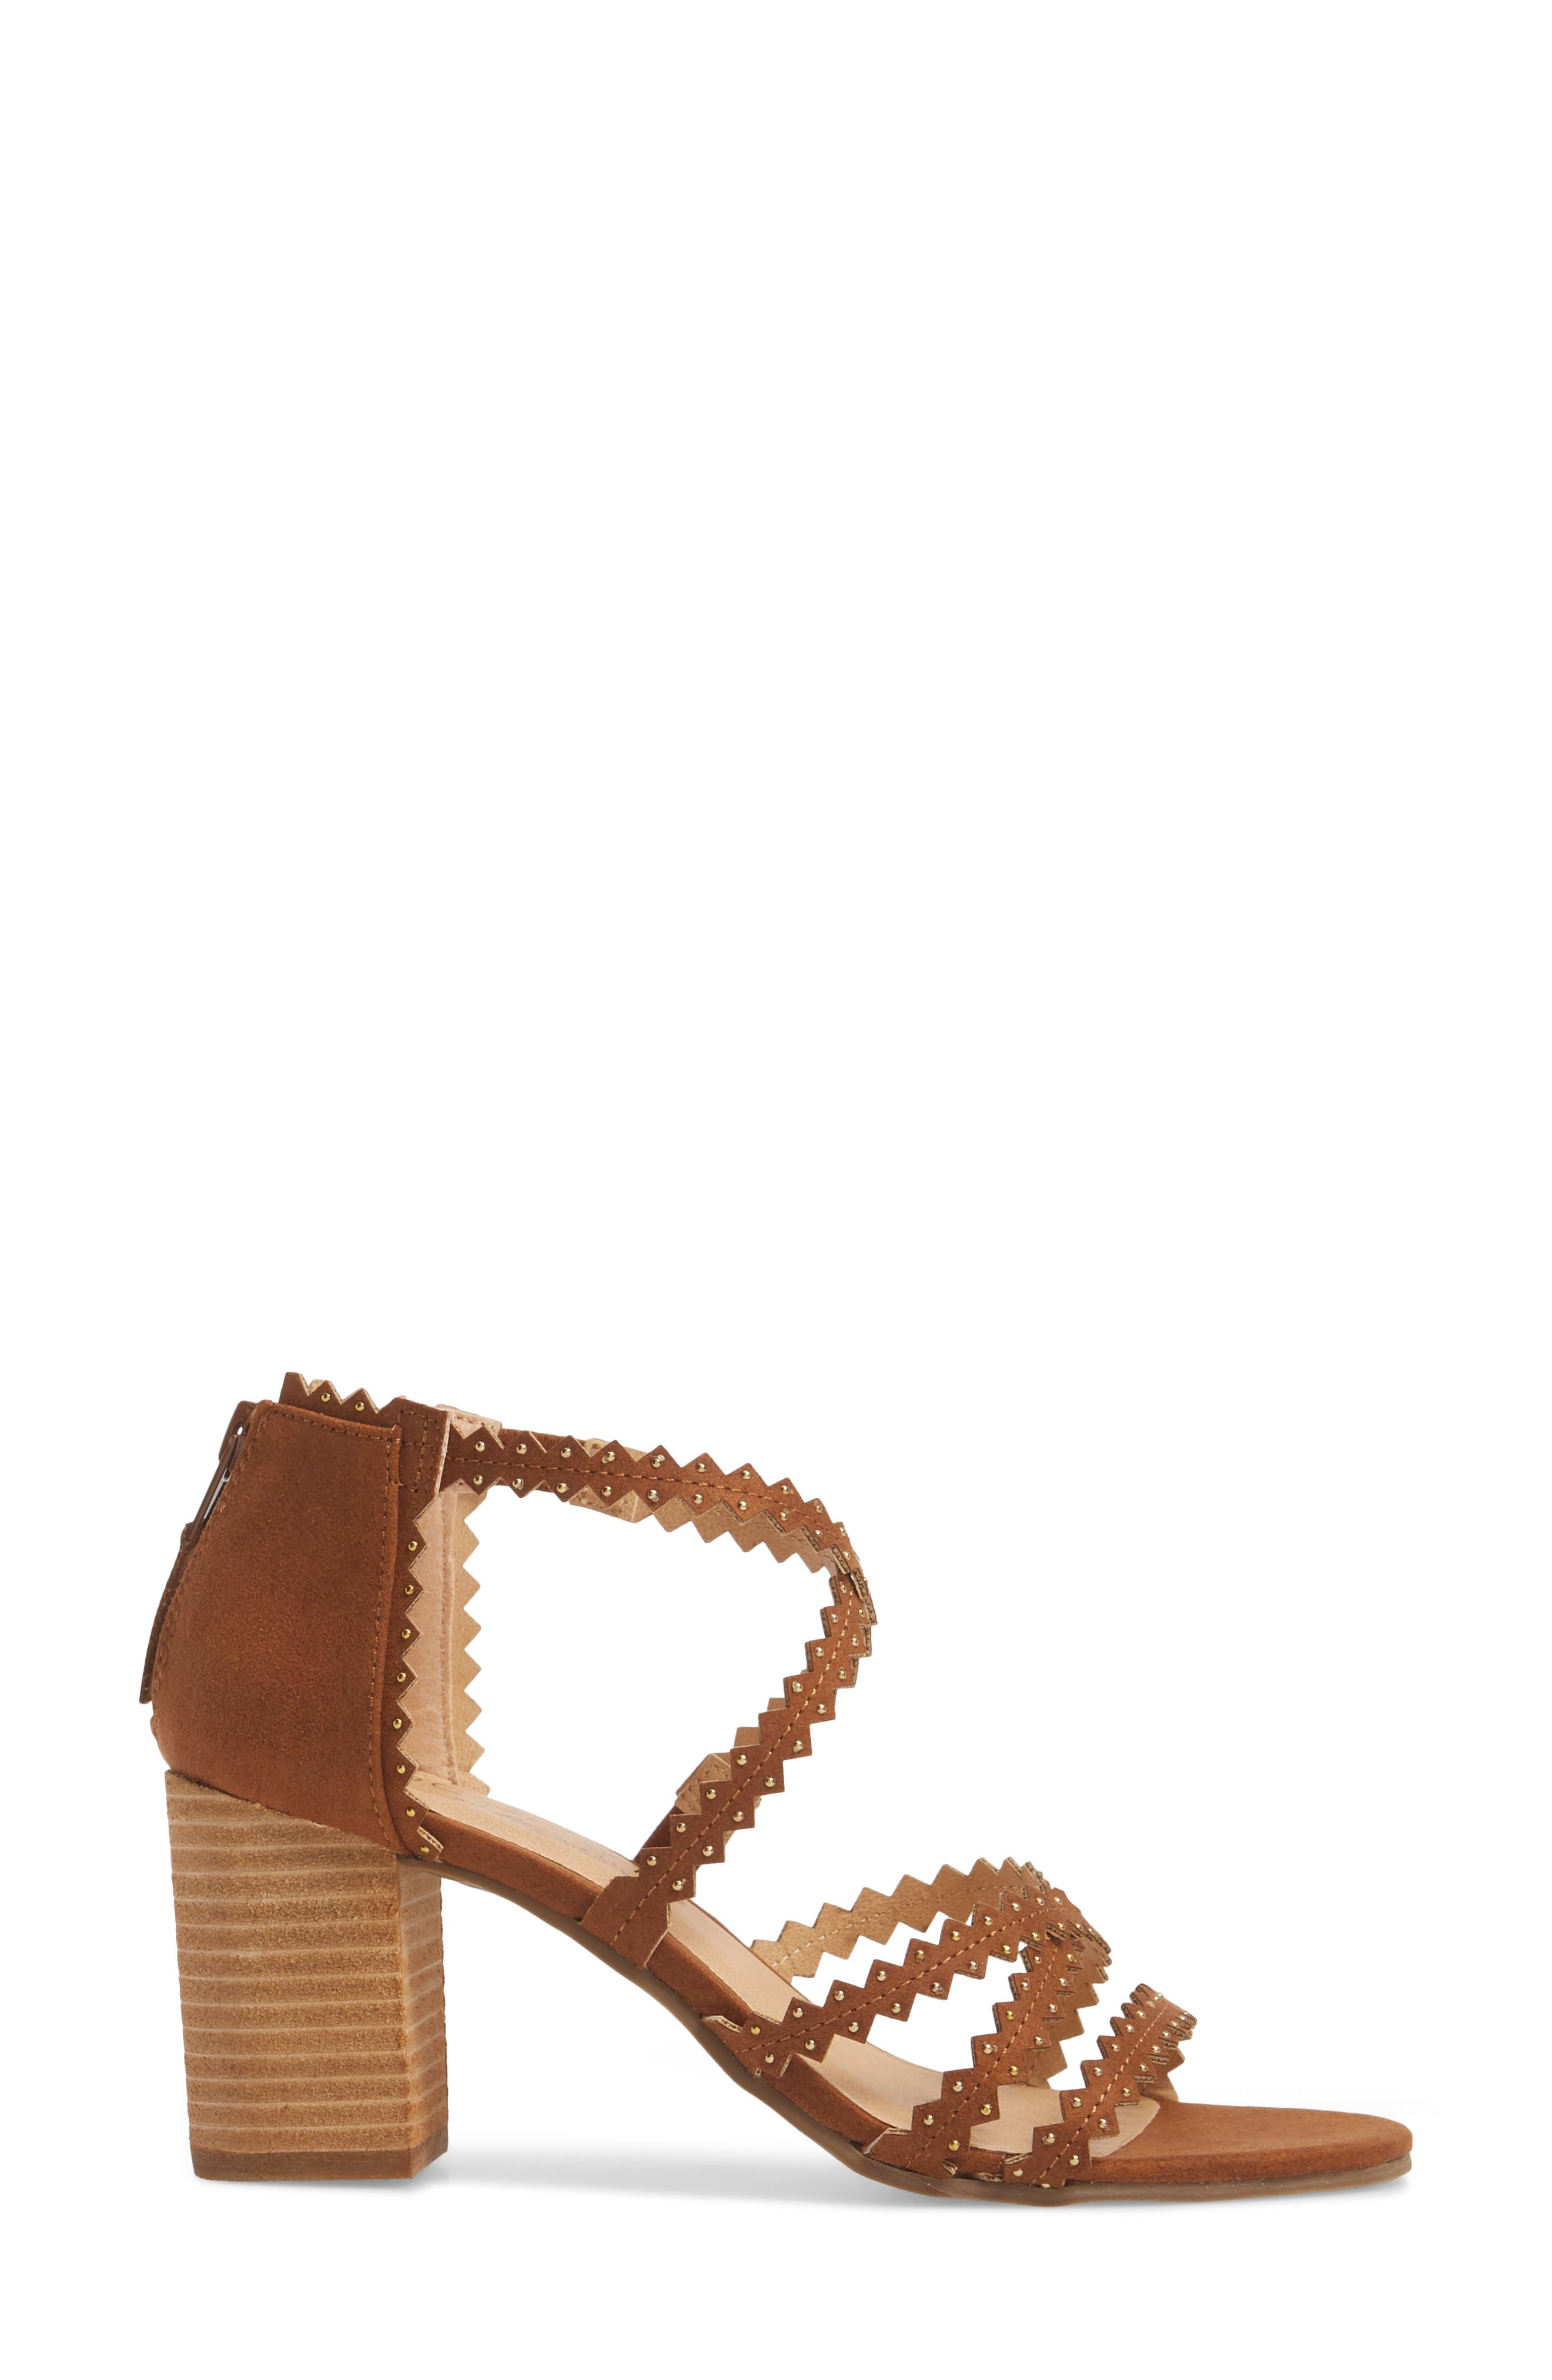 Aiden Block Heel Sandal,                             Alternate thumbnail 3, color,                             SADDLE SUEDE